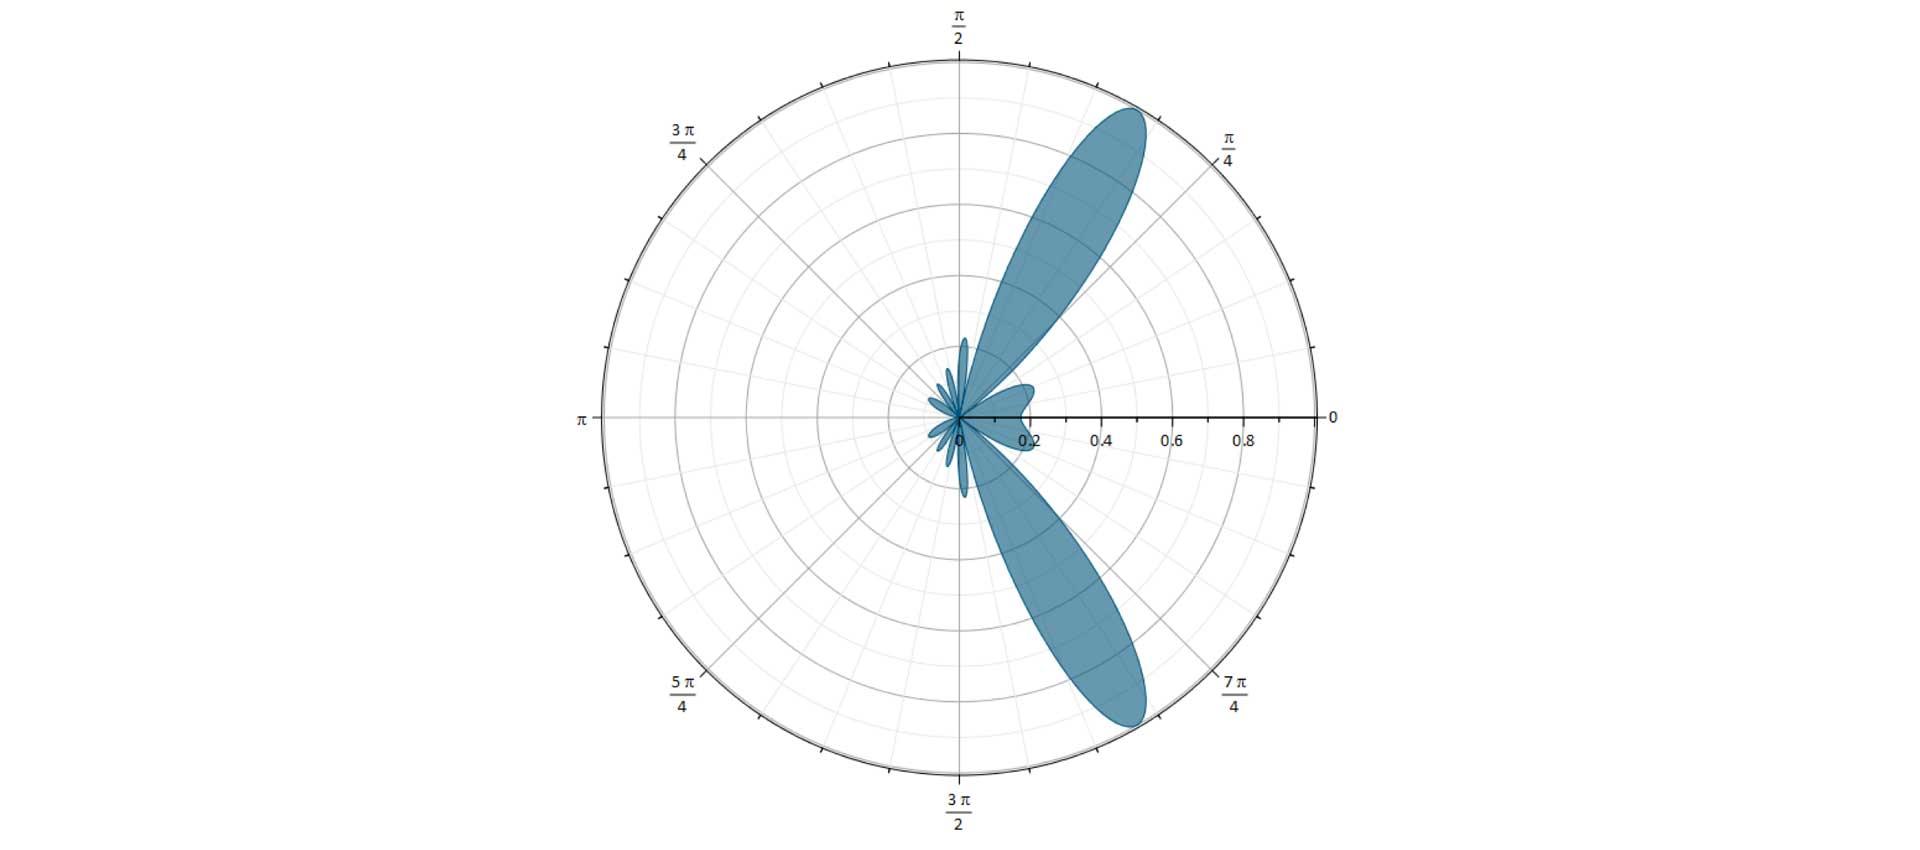 Polar Plot Of The Directivity Of An Antenna Array